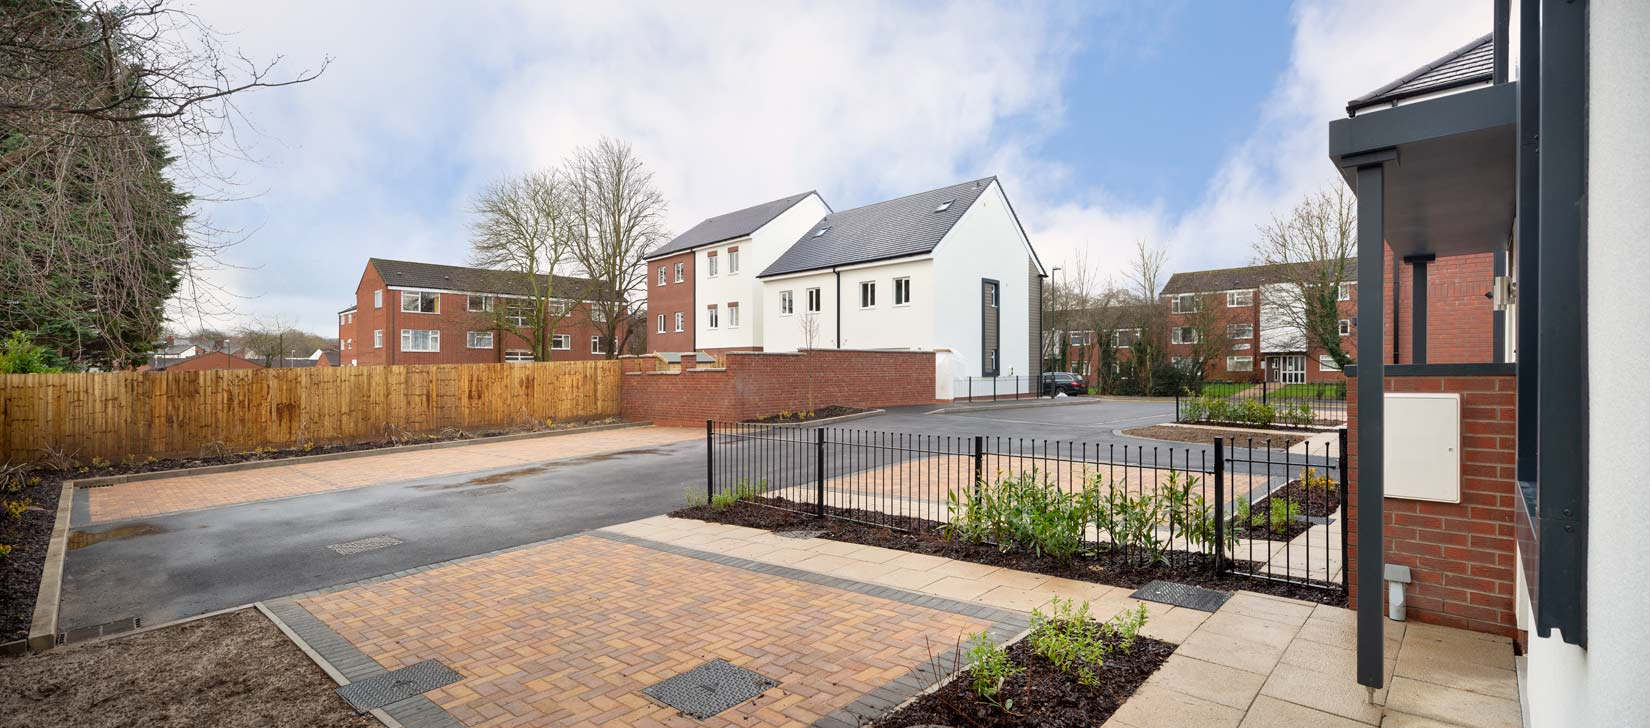 Heaton-court-new-housing-development-Chesterfield